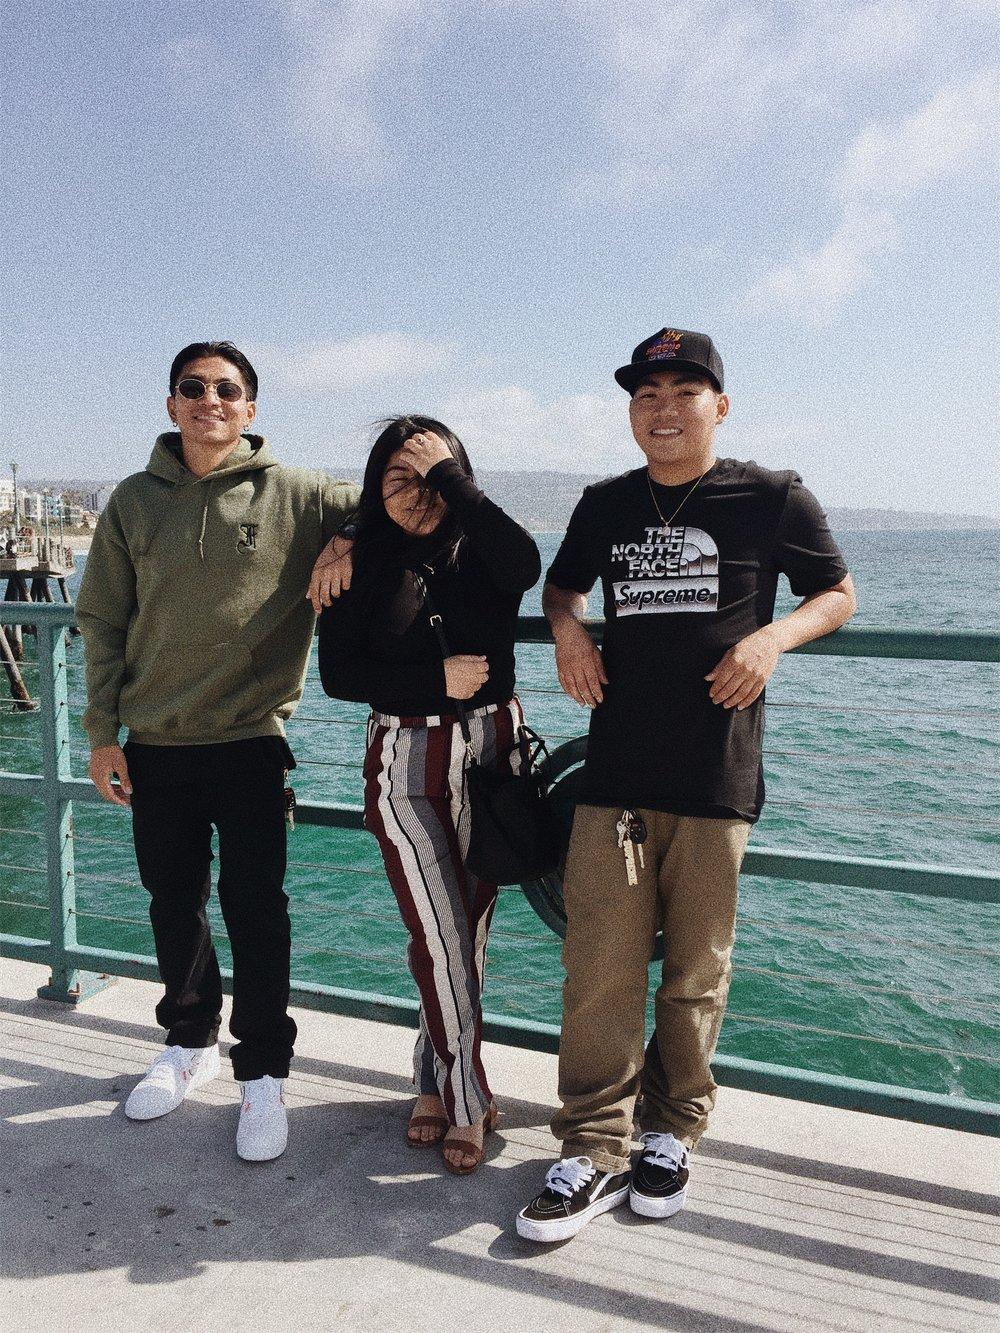 Location: Redondo Beach Boardwalk Pier, CA